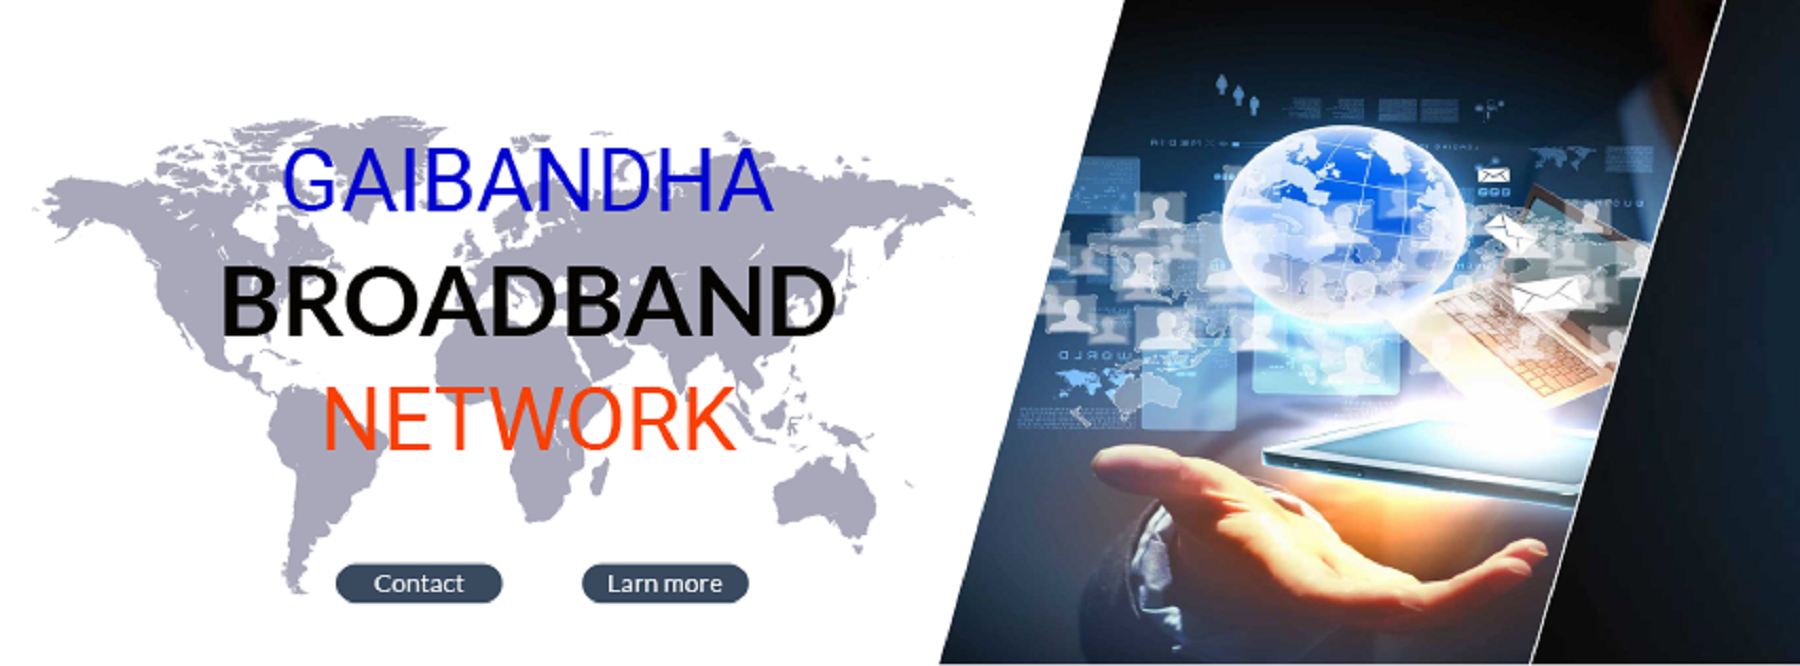 We Provide High Speed Internet